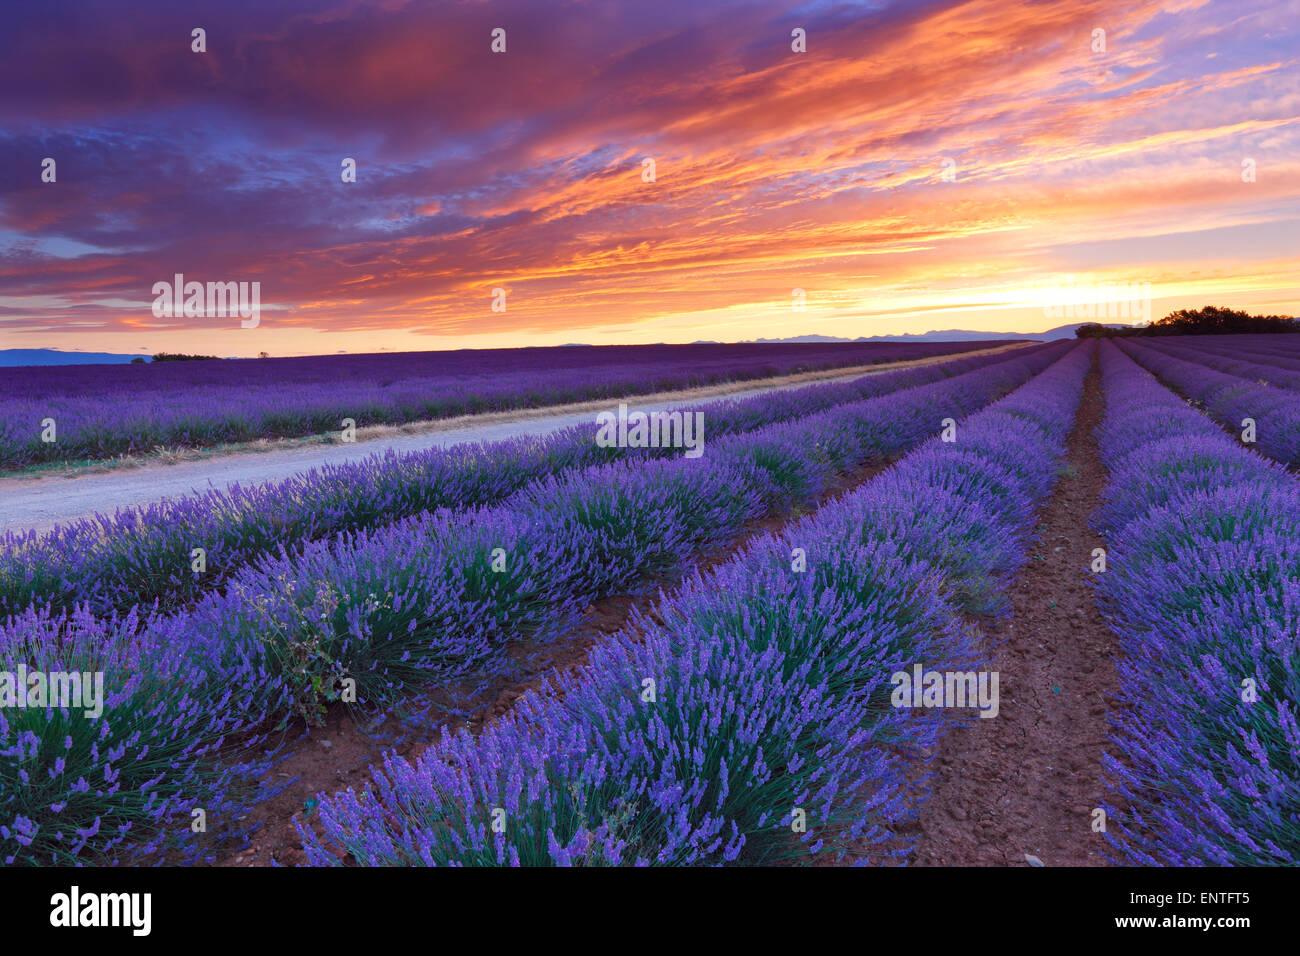 Sonnenaufgang über dem Lavendelfeld in Valensole, Provence, Frankreich Stockbild